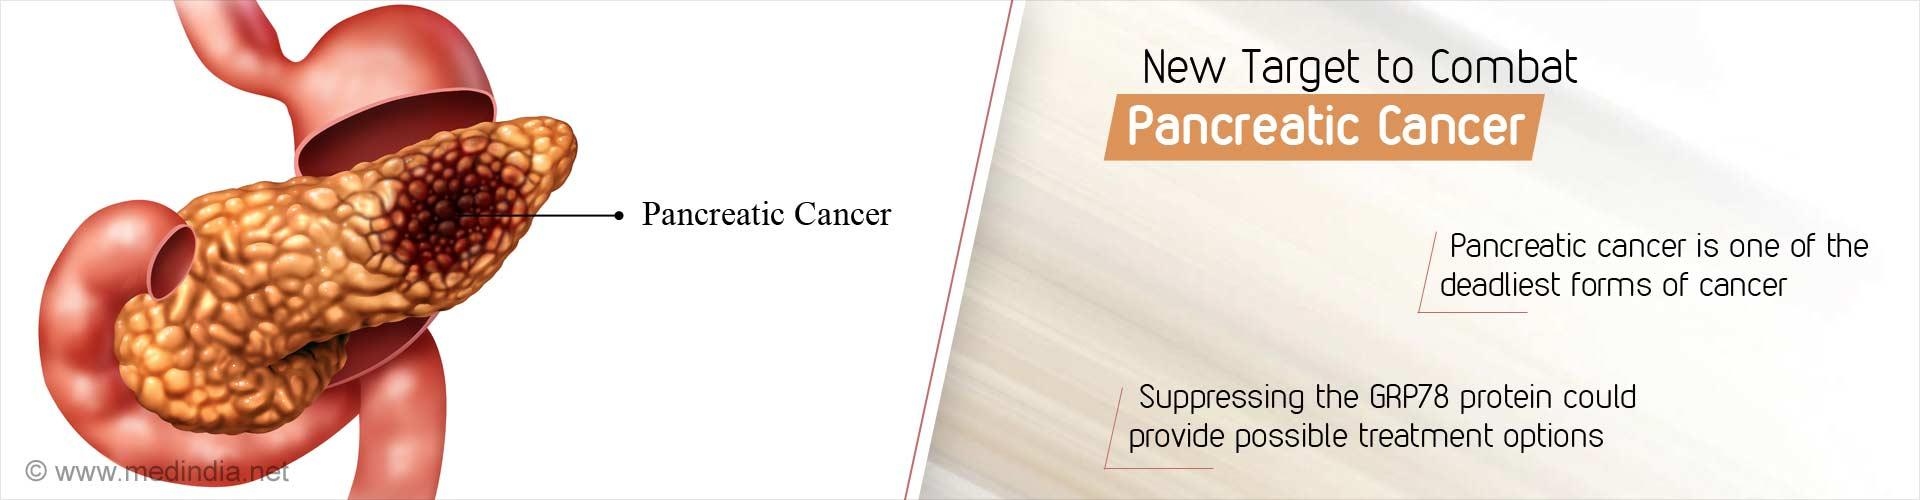 Promising Pancreatic Cancer Target Identified